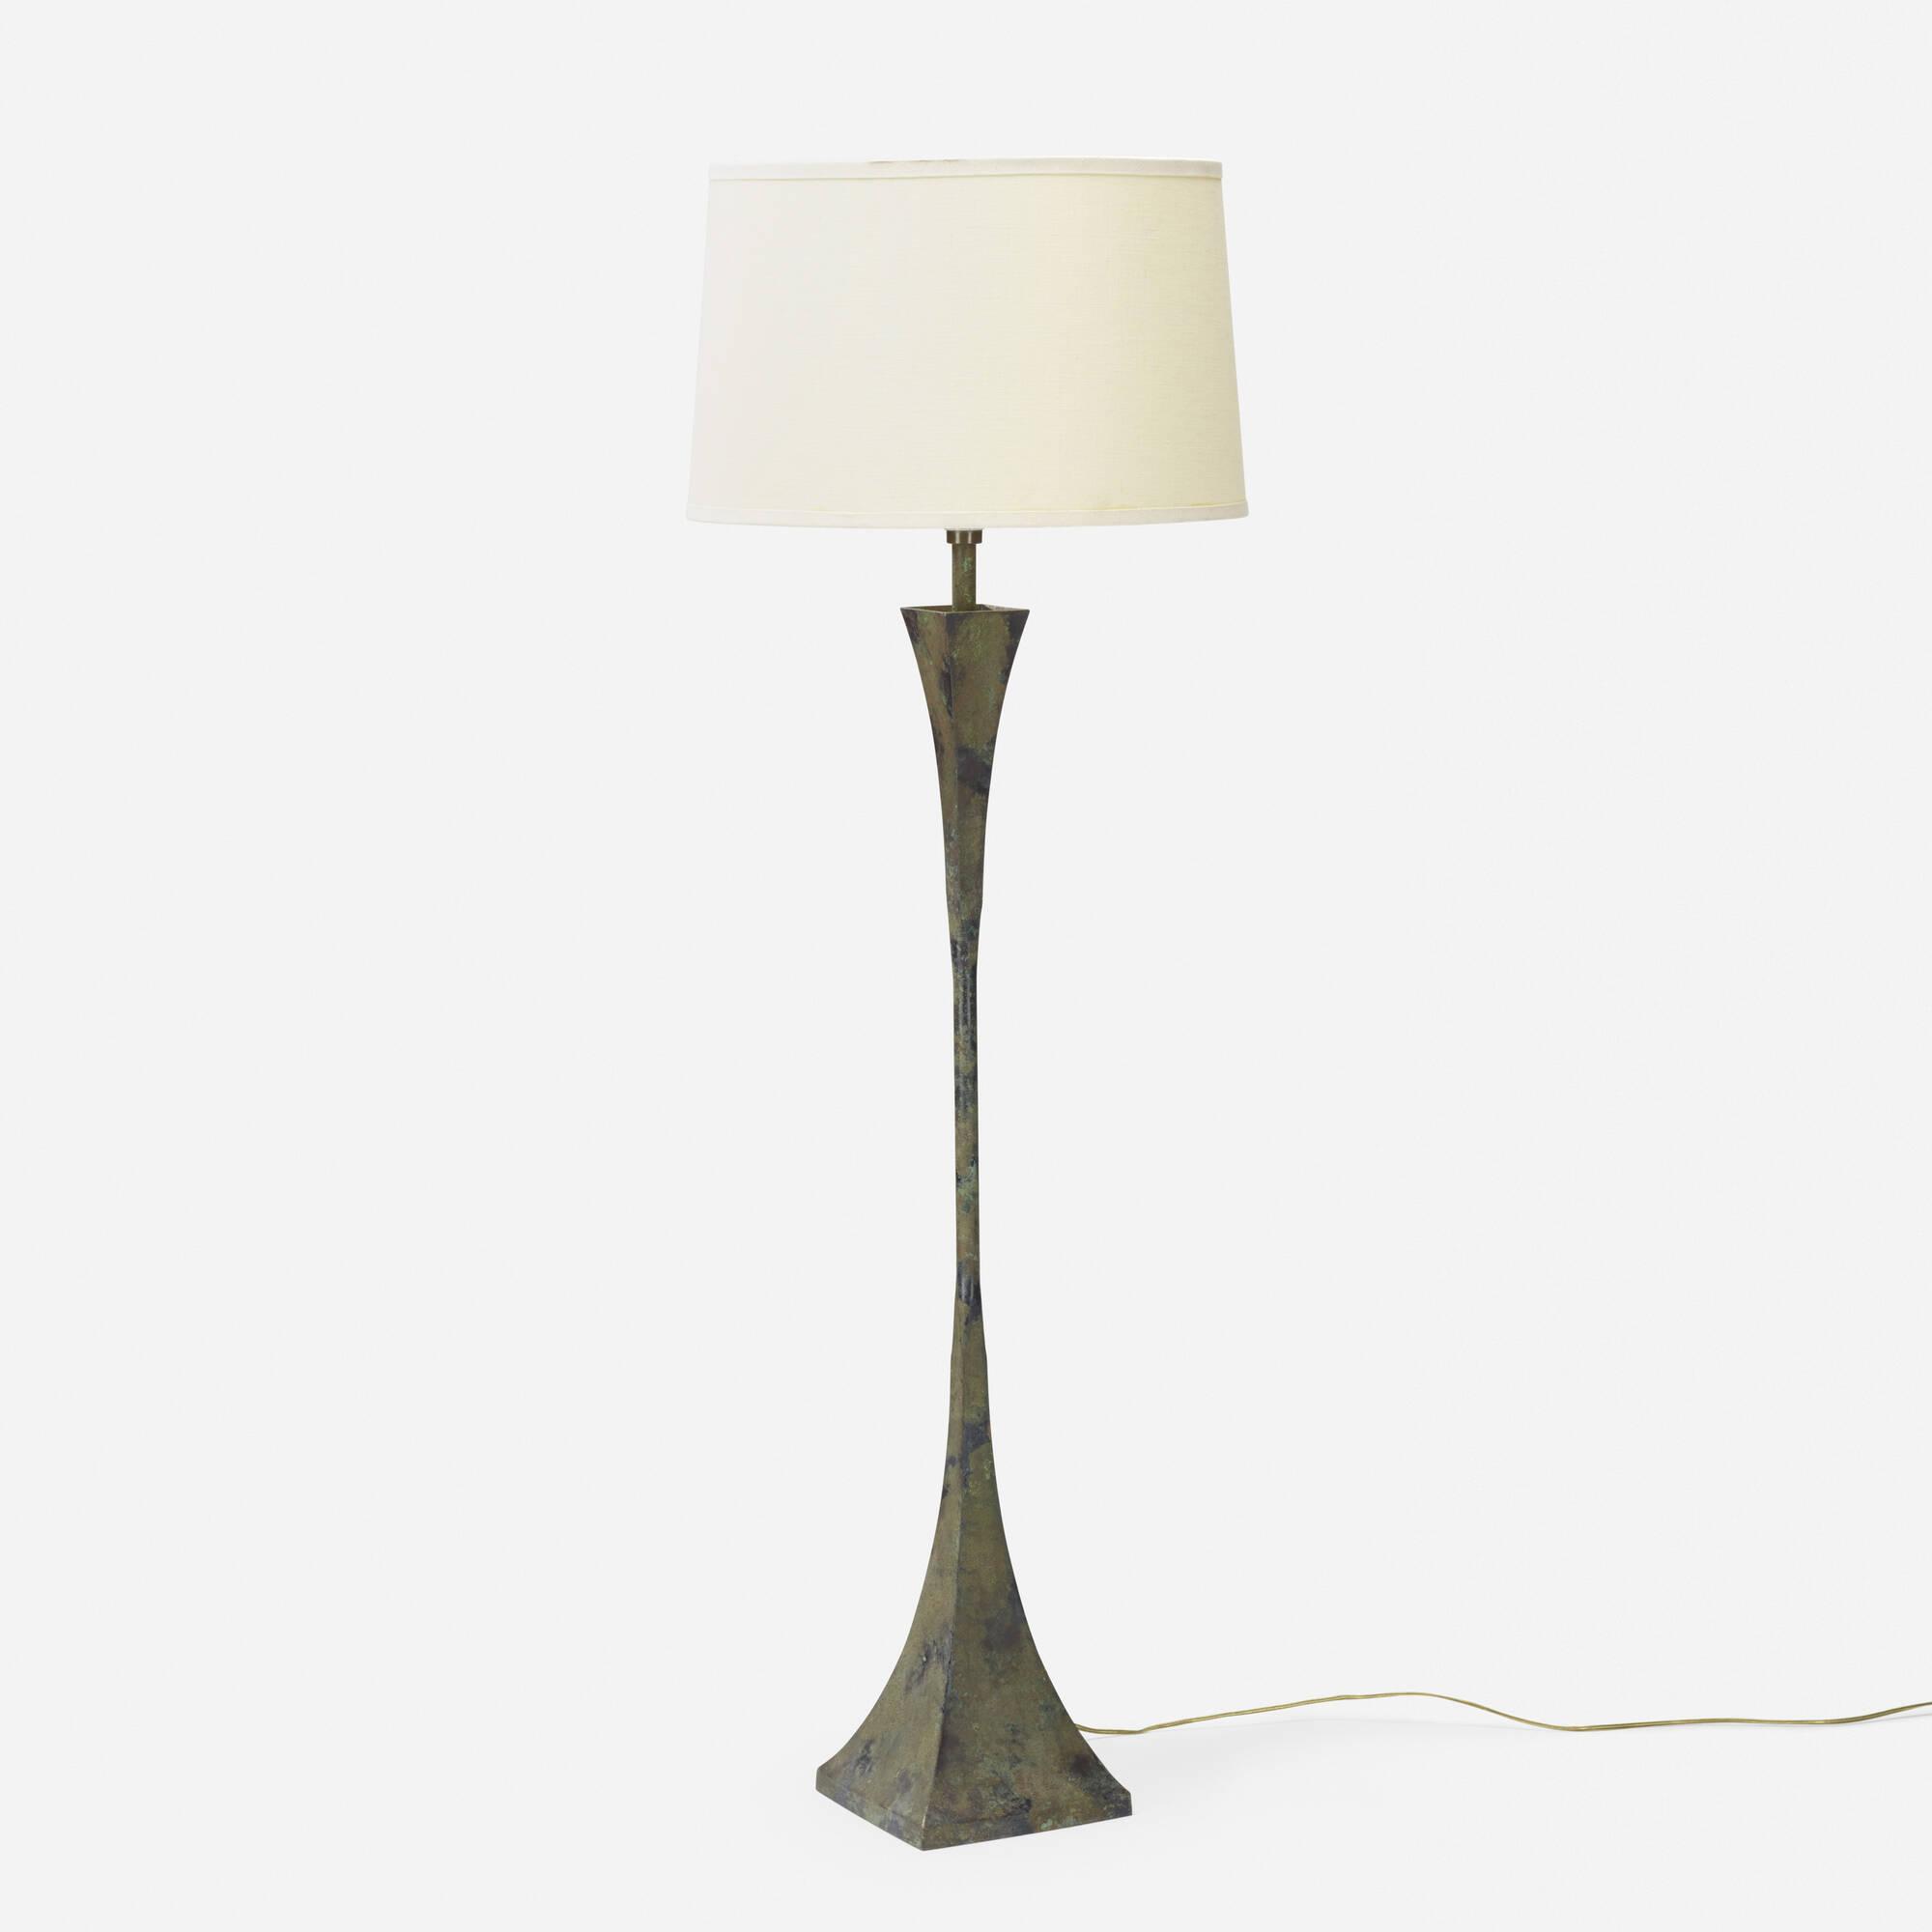 340: Stewart Ross James / Verdigris floor lamp (1 of 1)